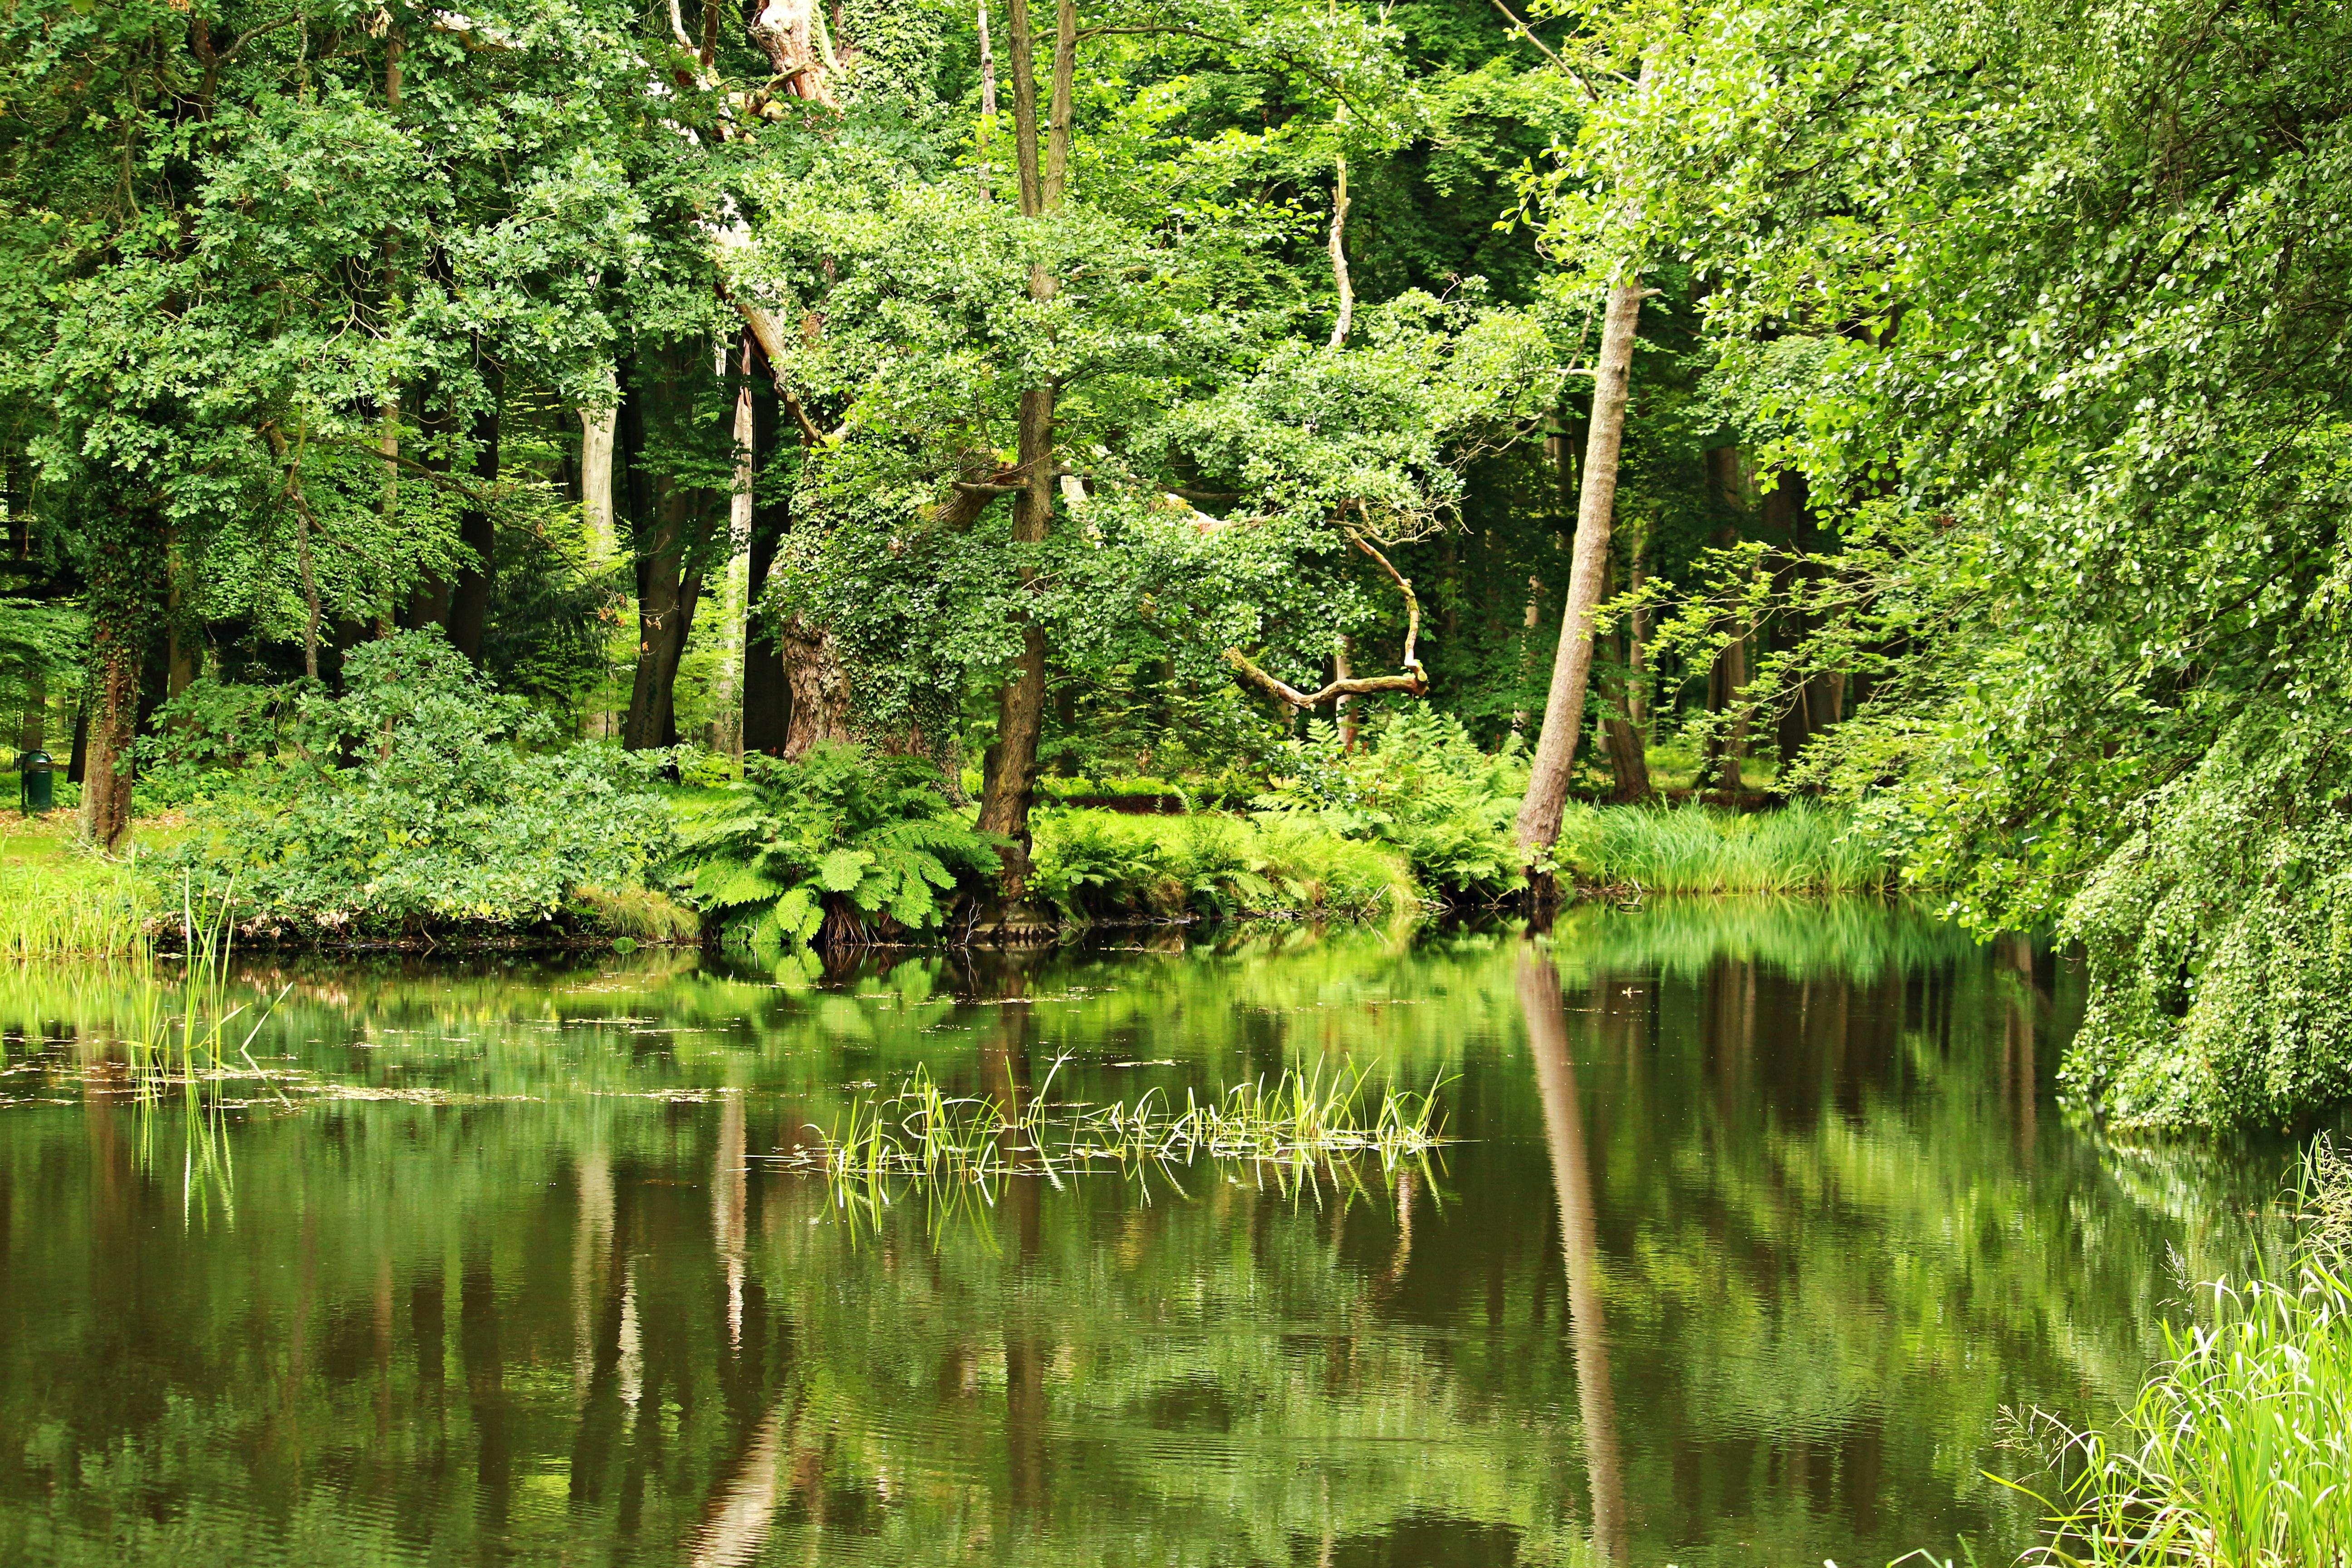 Free Images Tree Water Swamp Wilderness Meadow Leaf Flower Lake River Stream Green Reflection Jungle Botany Garden Trees Bank Vegetation